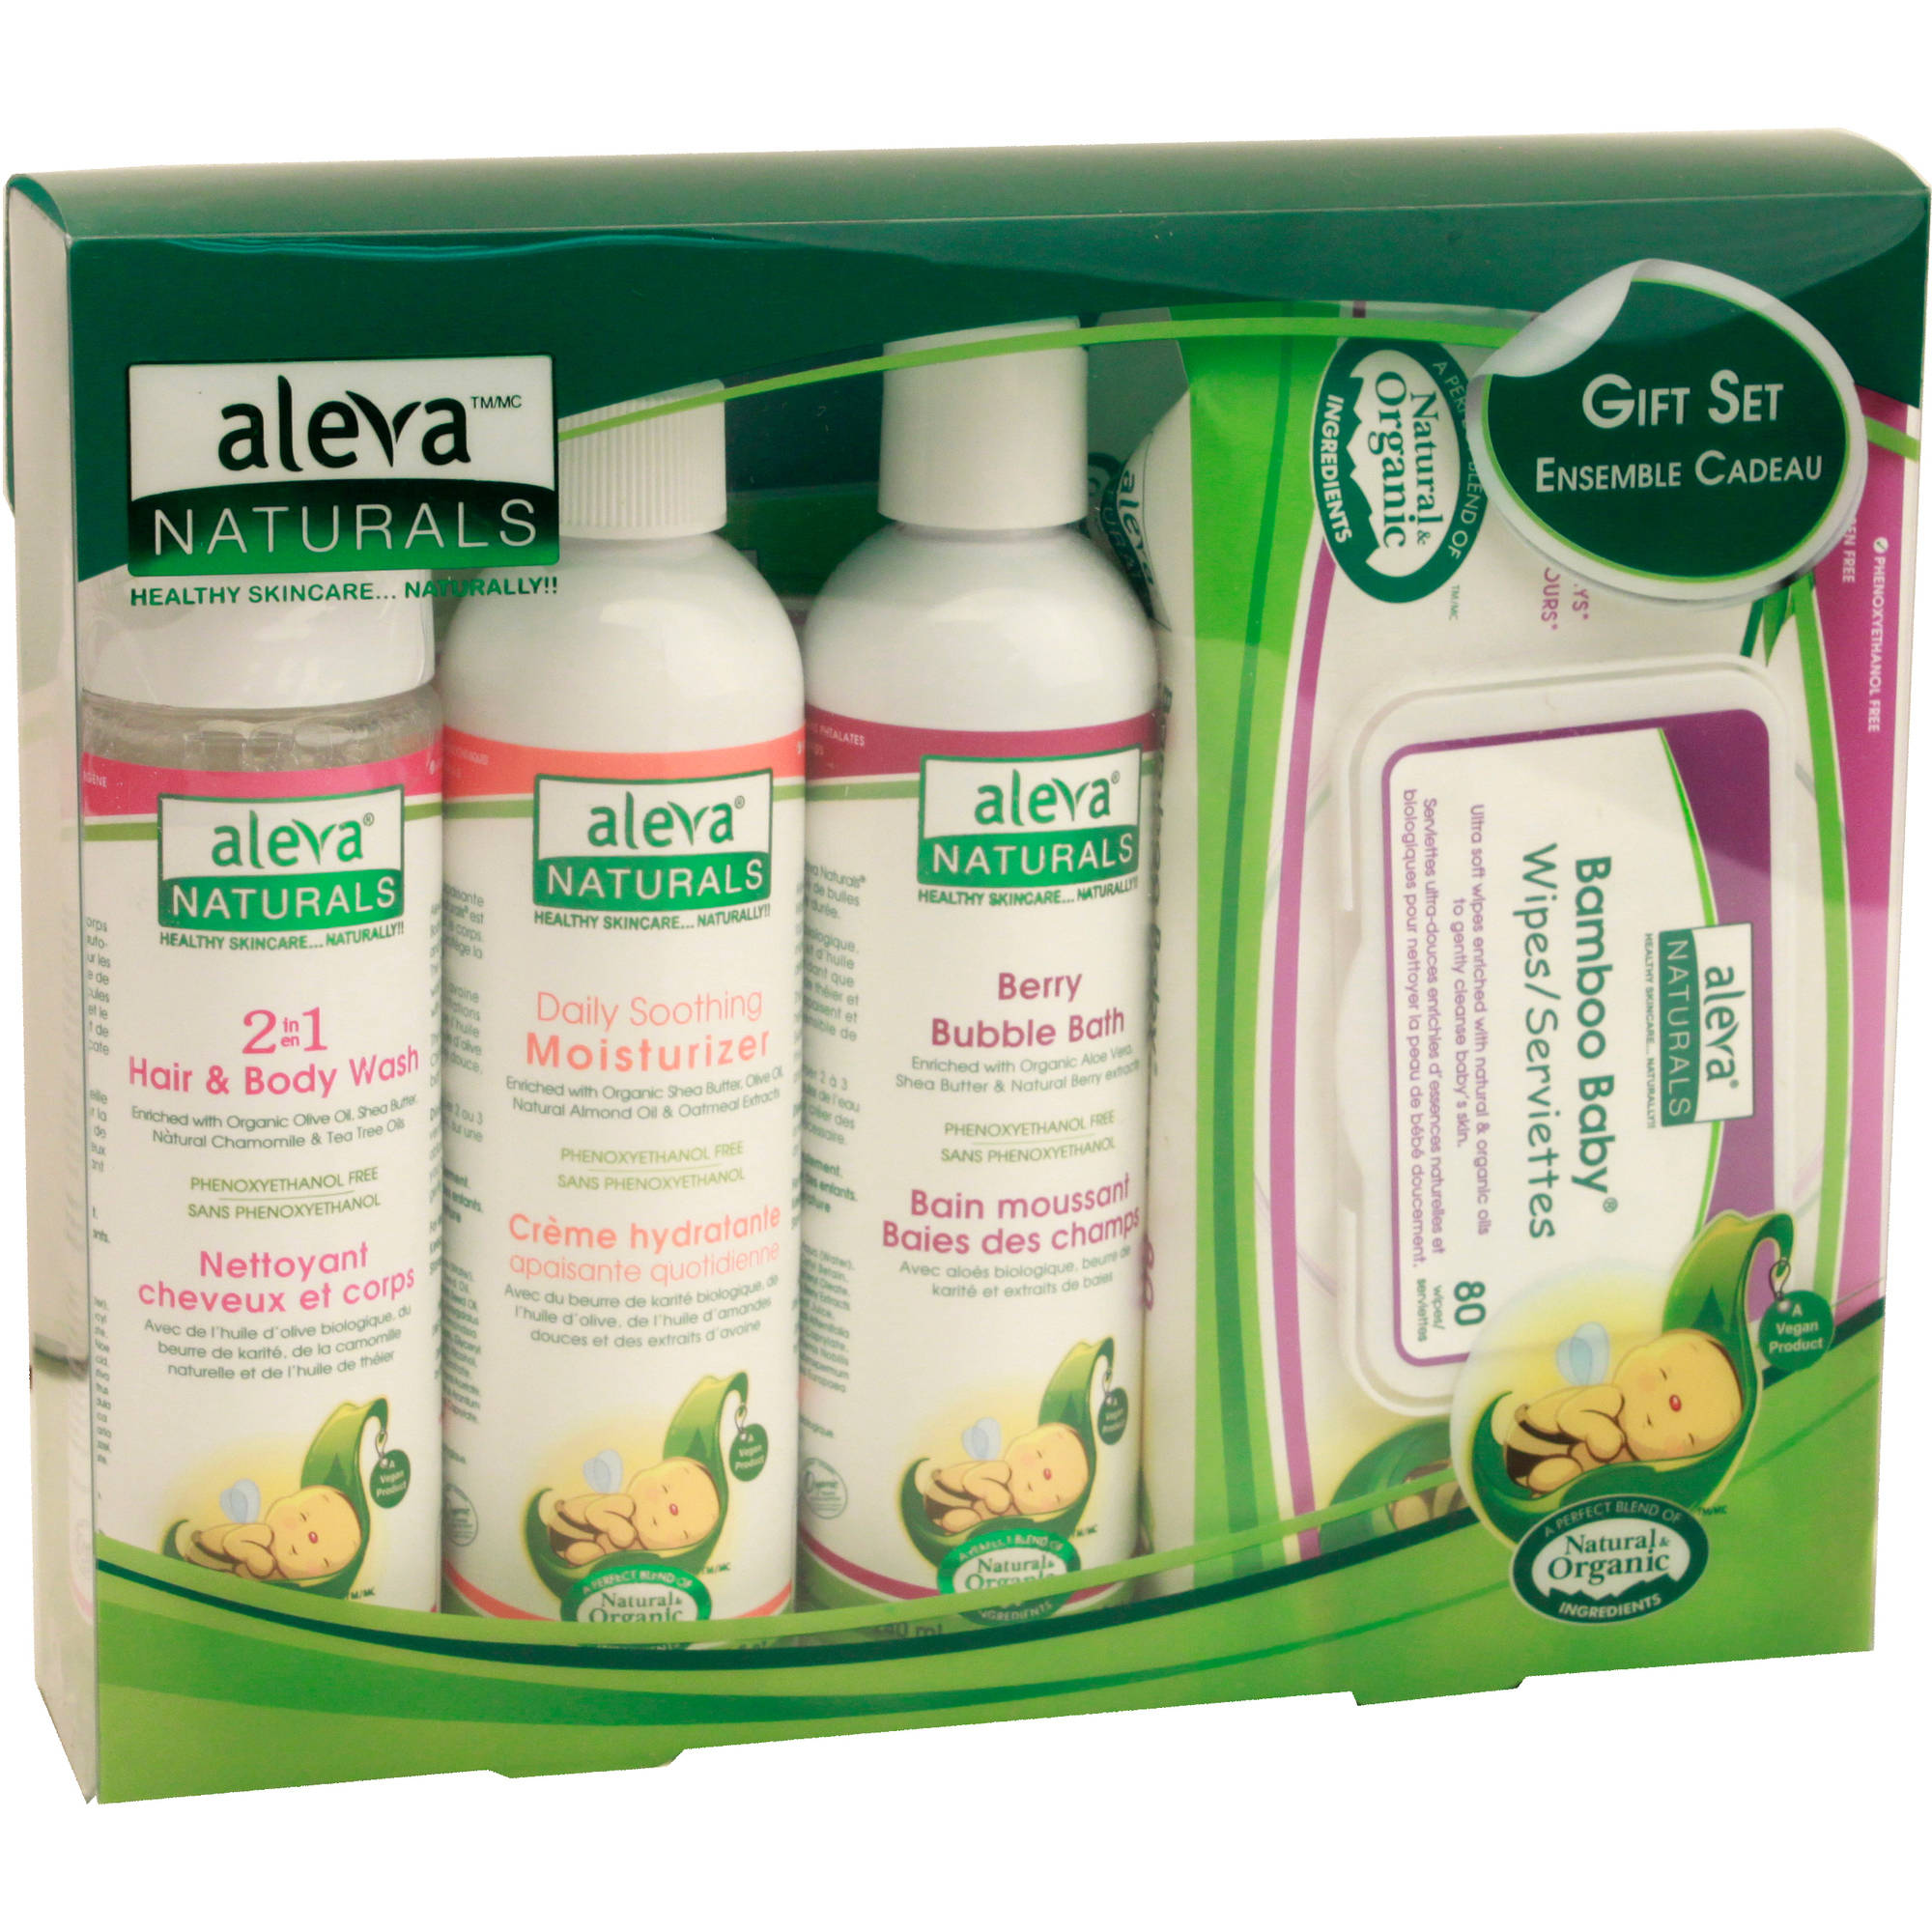 Aleva Naturals Newborn Gift Set, 4 pc